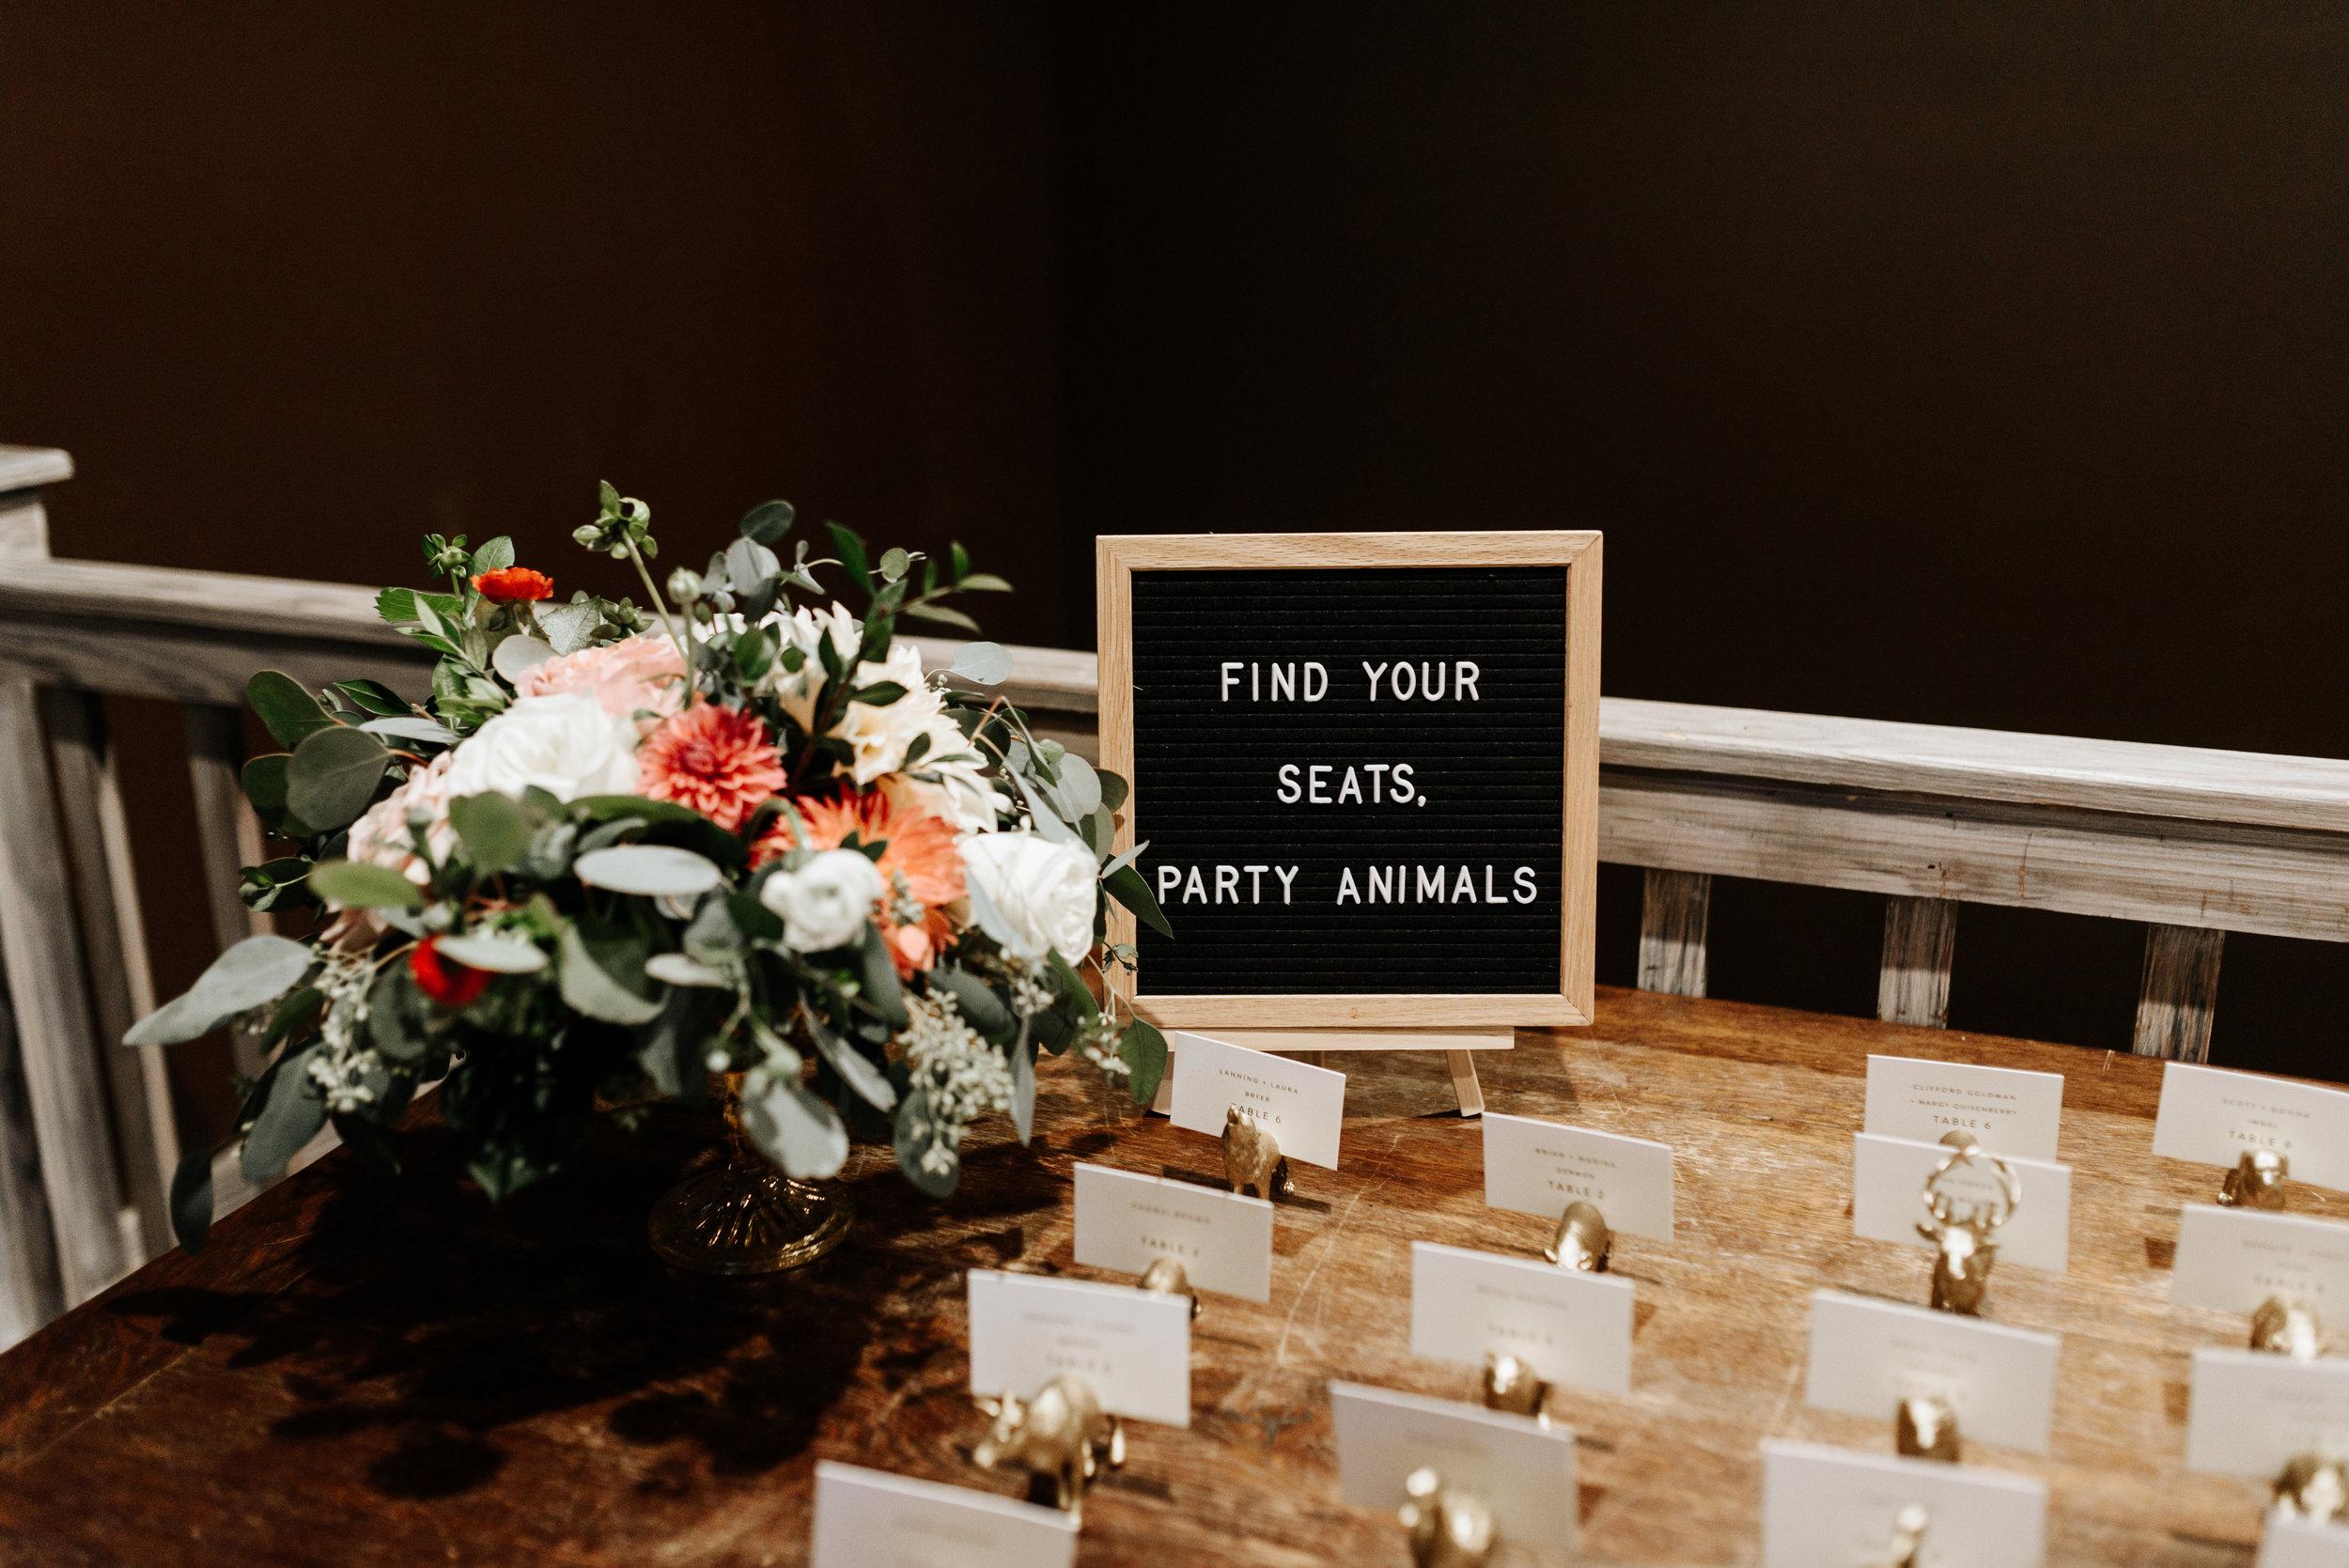 Veritas-Vineyards-and-Winery-Wedding-Photography-Afton-Virginia-Yasmin-Seth-Photography-by-V-9670.jpg